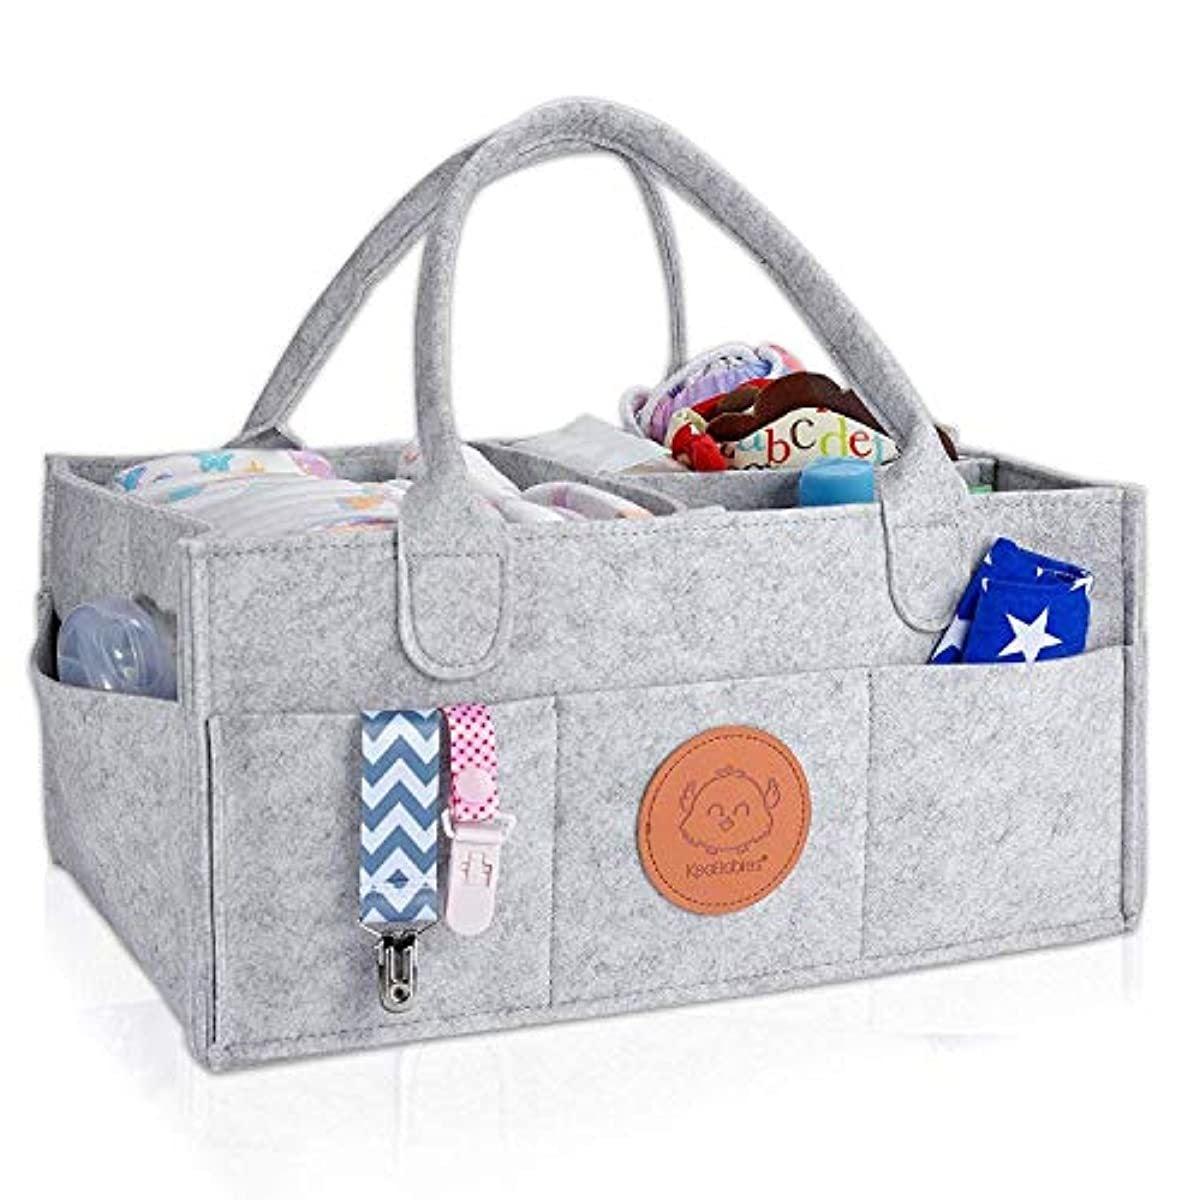 Baby Diaper Organizer Bag